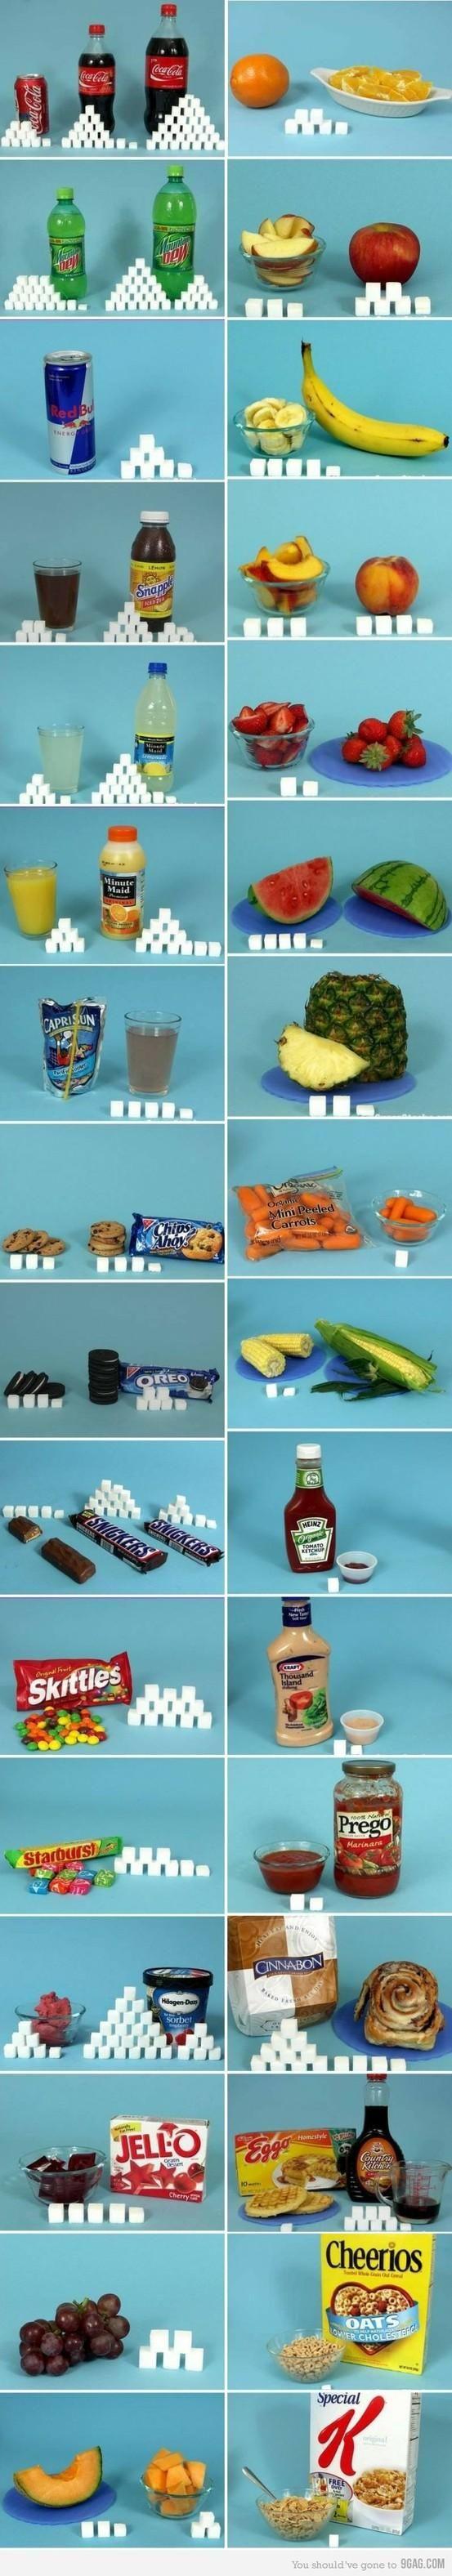 Pinspire - Soviel Zucker ist in den Lebensmitteln